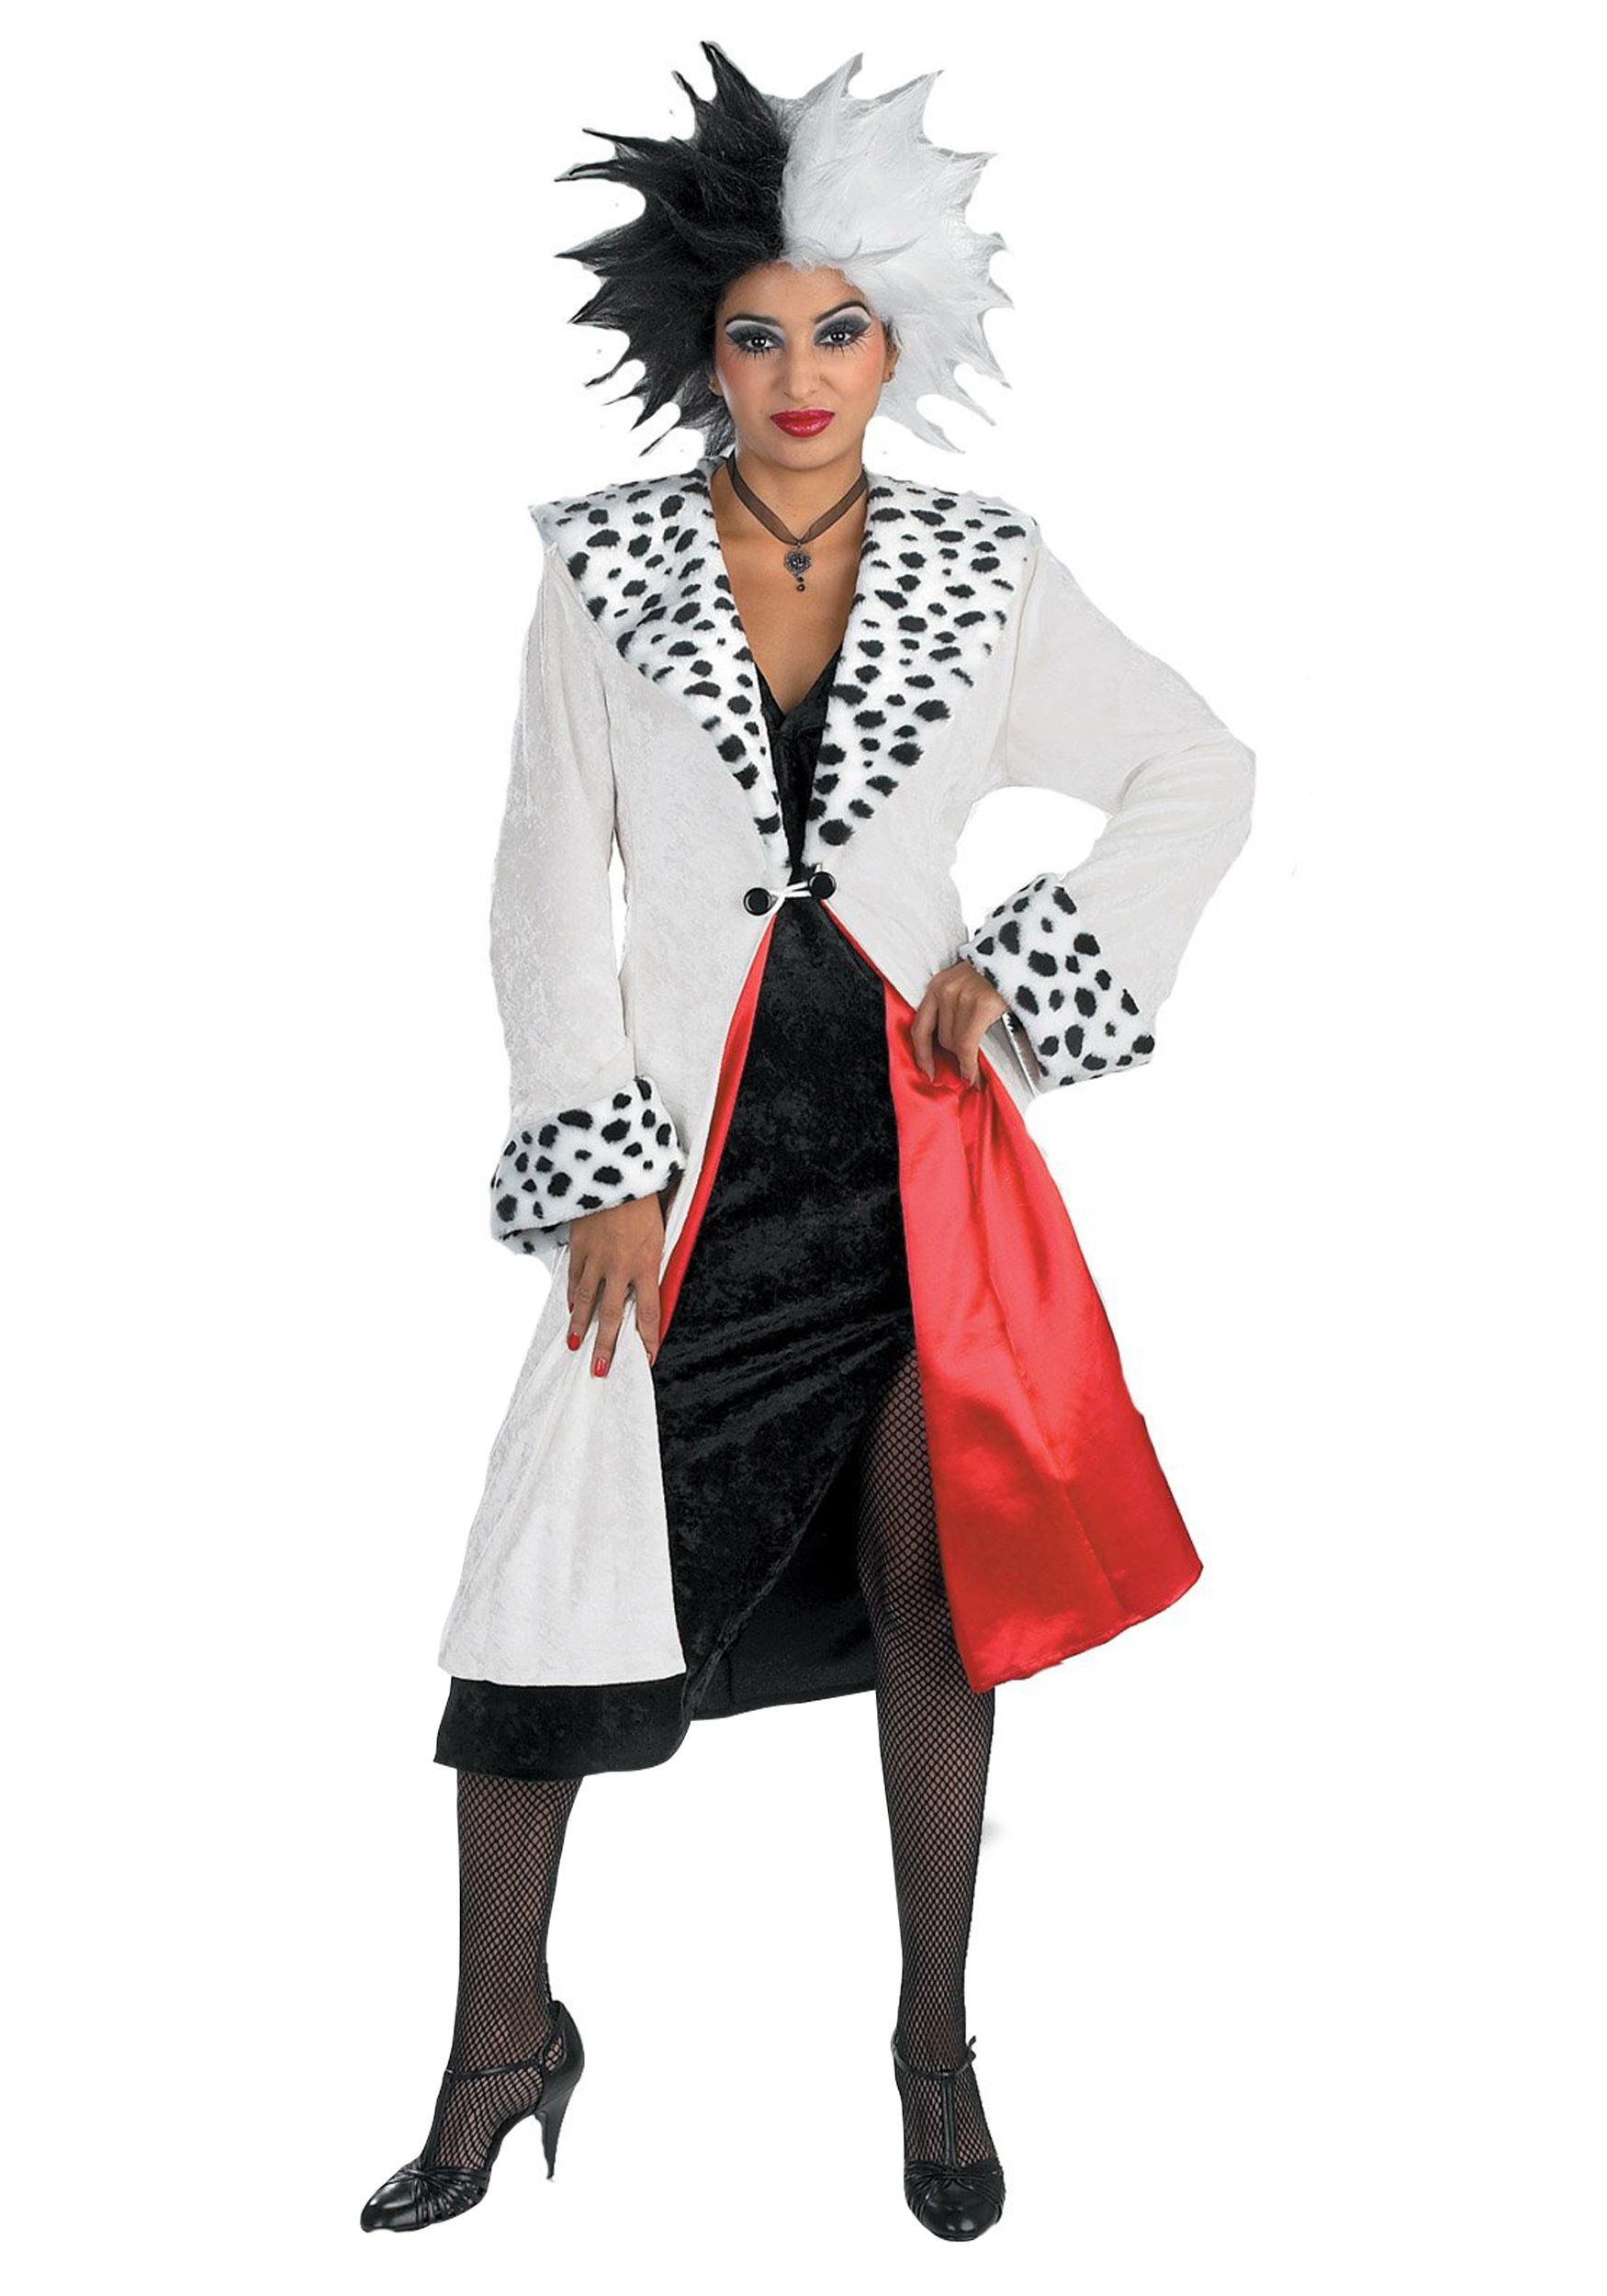 Prestige Adult Cruella Devil Costume  sc 1 st  Halloween Costumes & Prestige Adult Cruella De Vil Costume